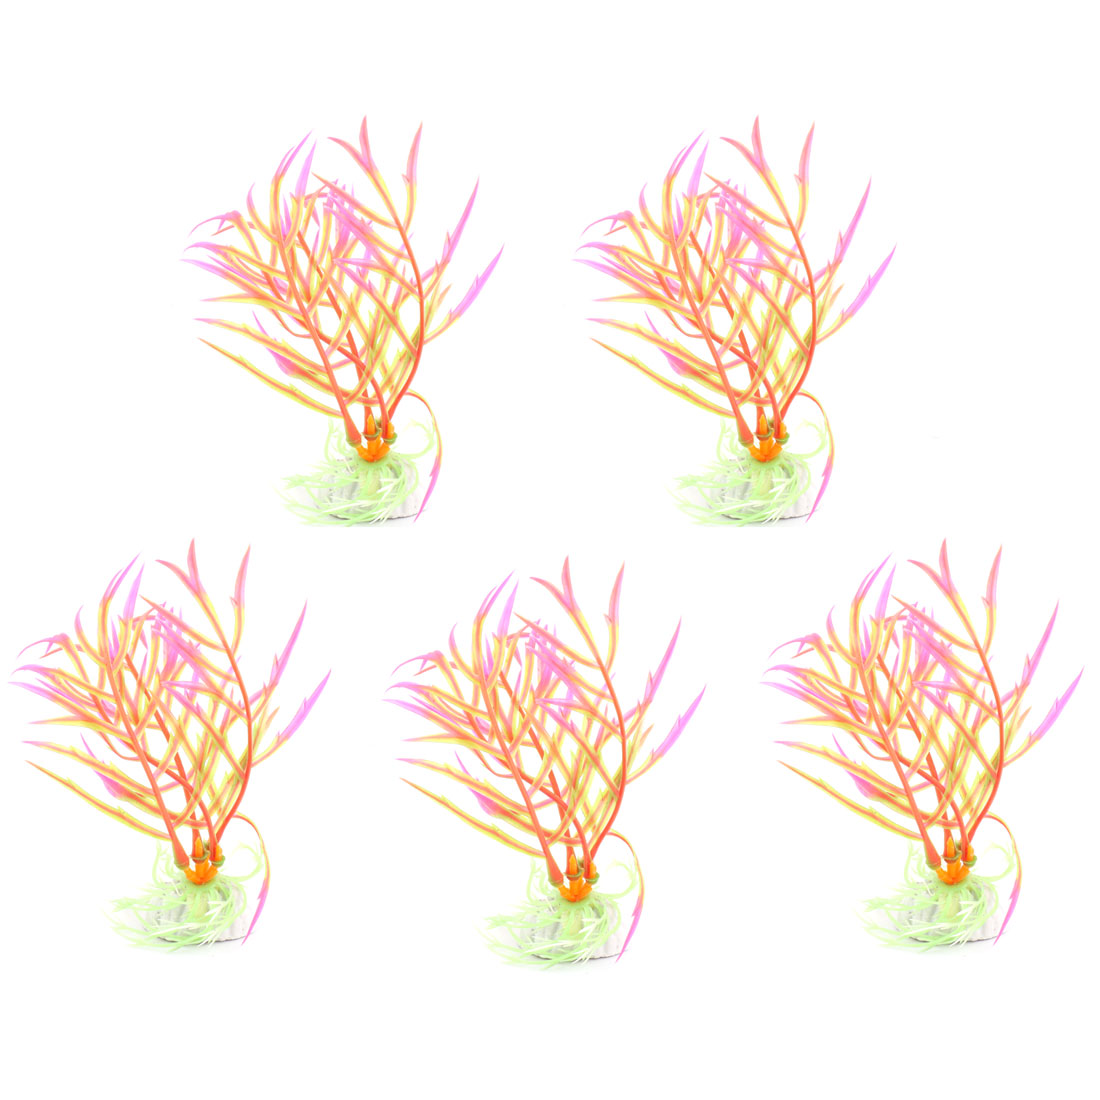 5 Pcs Shocking Pink Green Plastic Plants for Aquarium Fish Tank Ornament